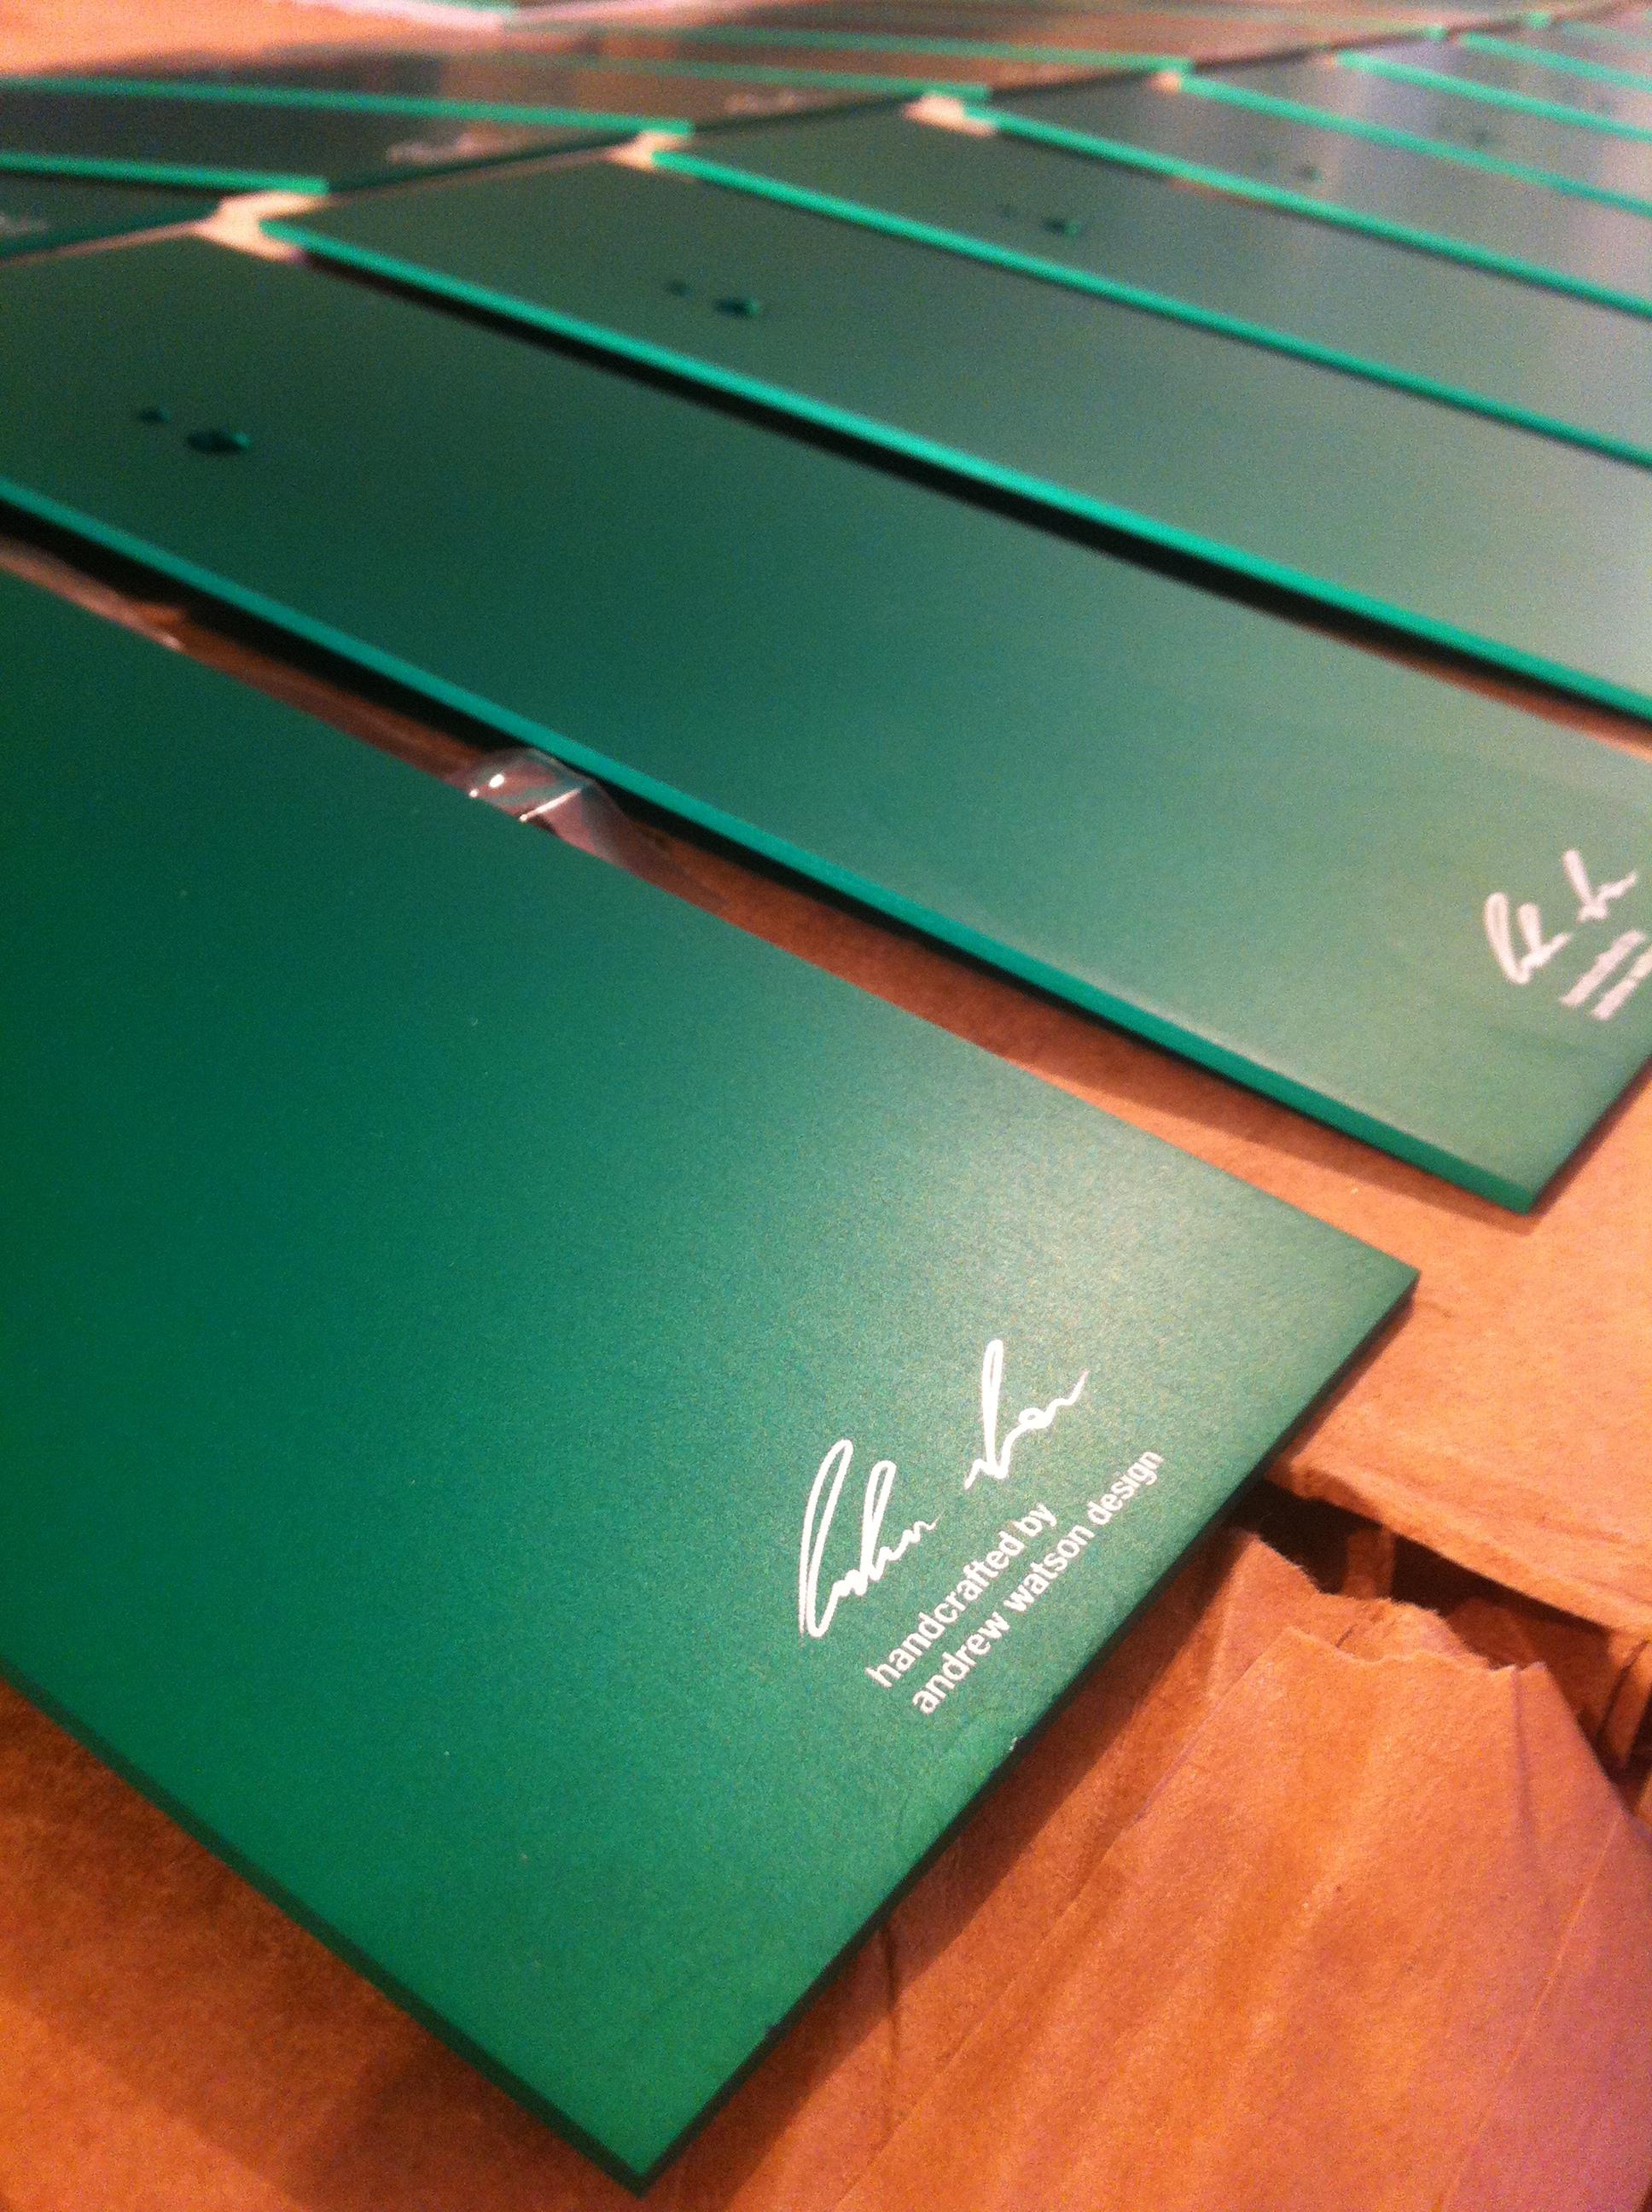 eco plaque, sustainable plaque, sustainable trophy, sustainable award, eco award, eco trophy, eco trophies